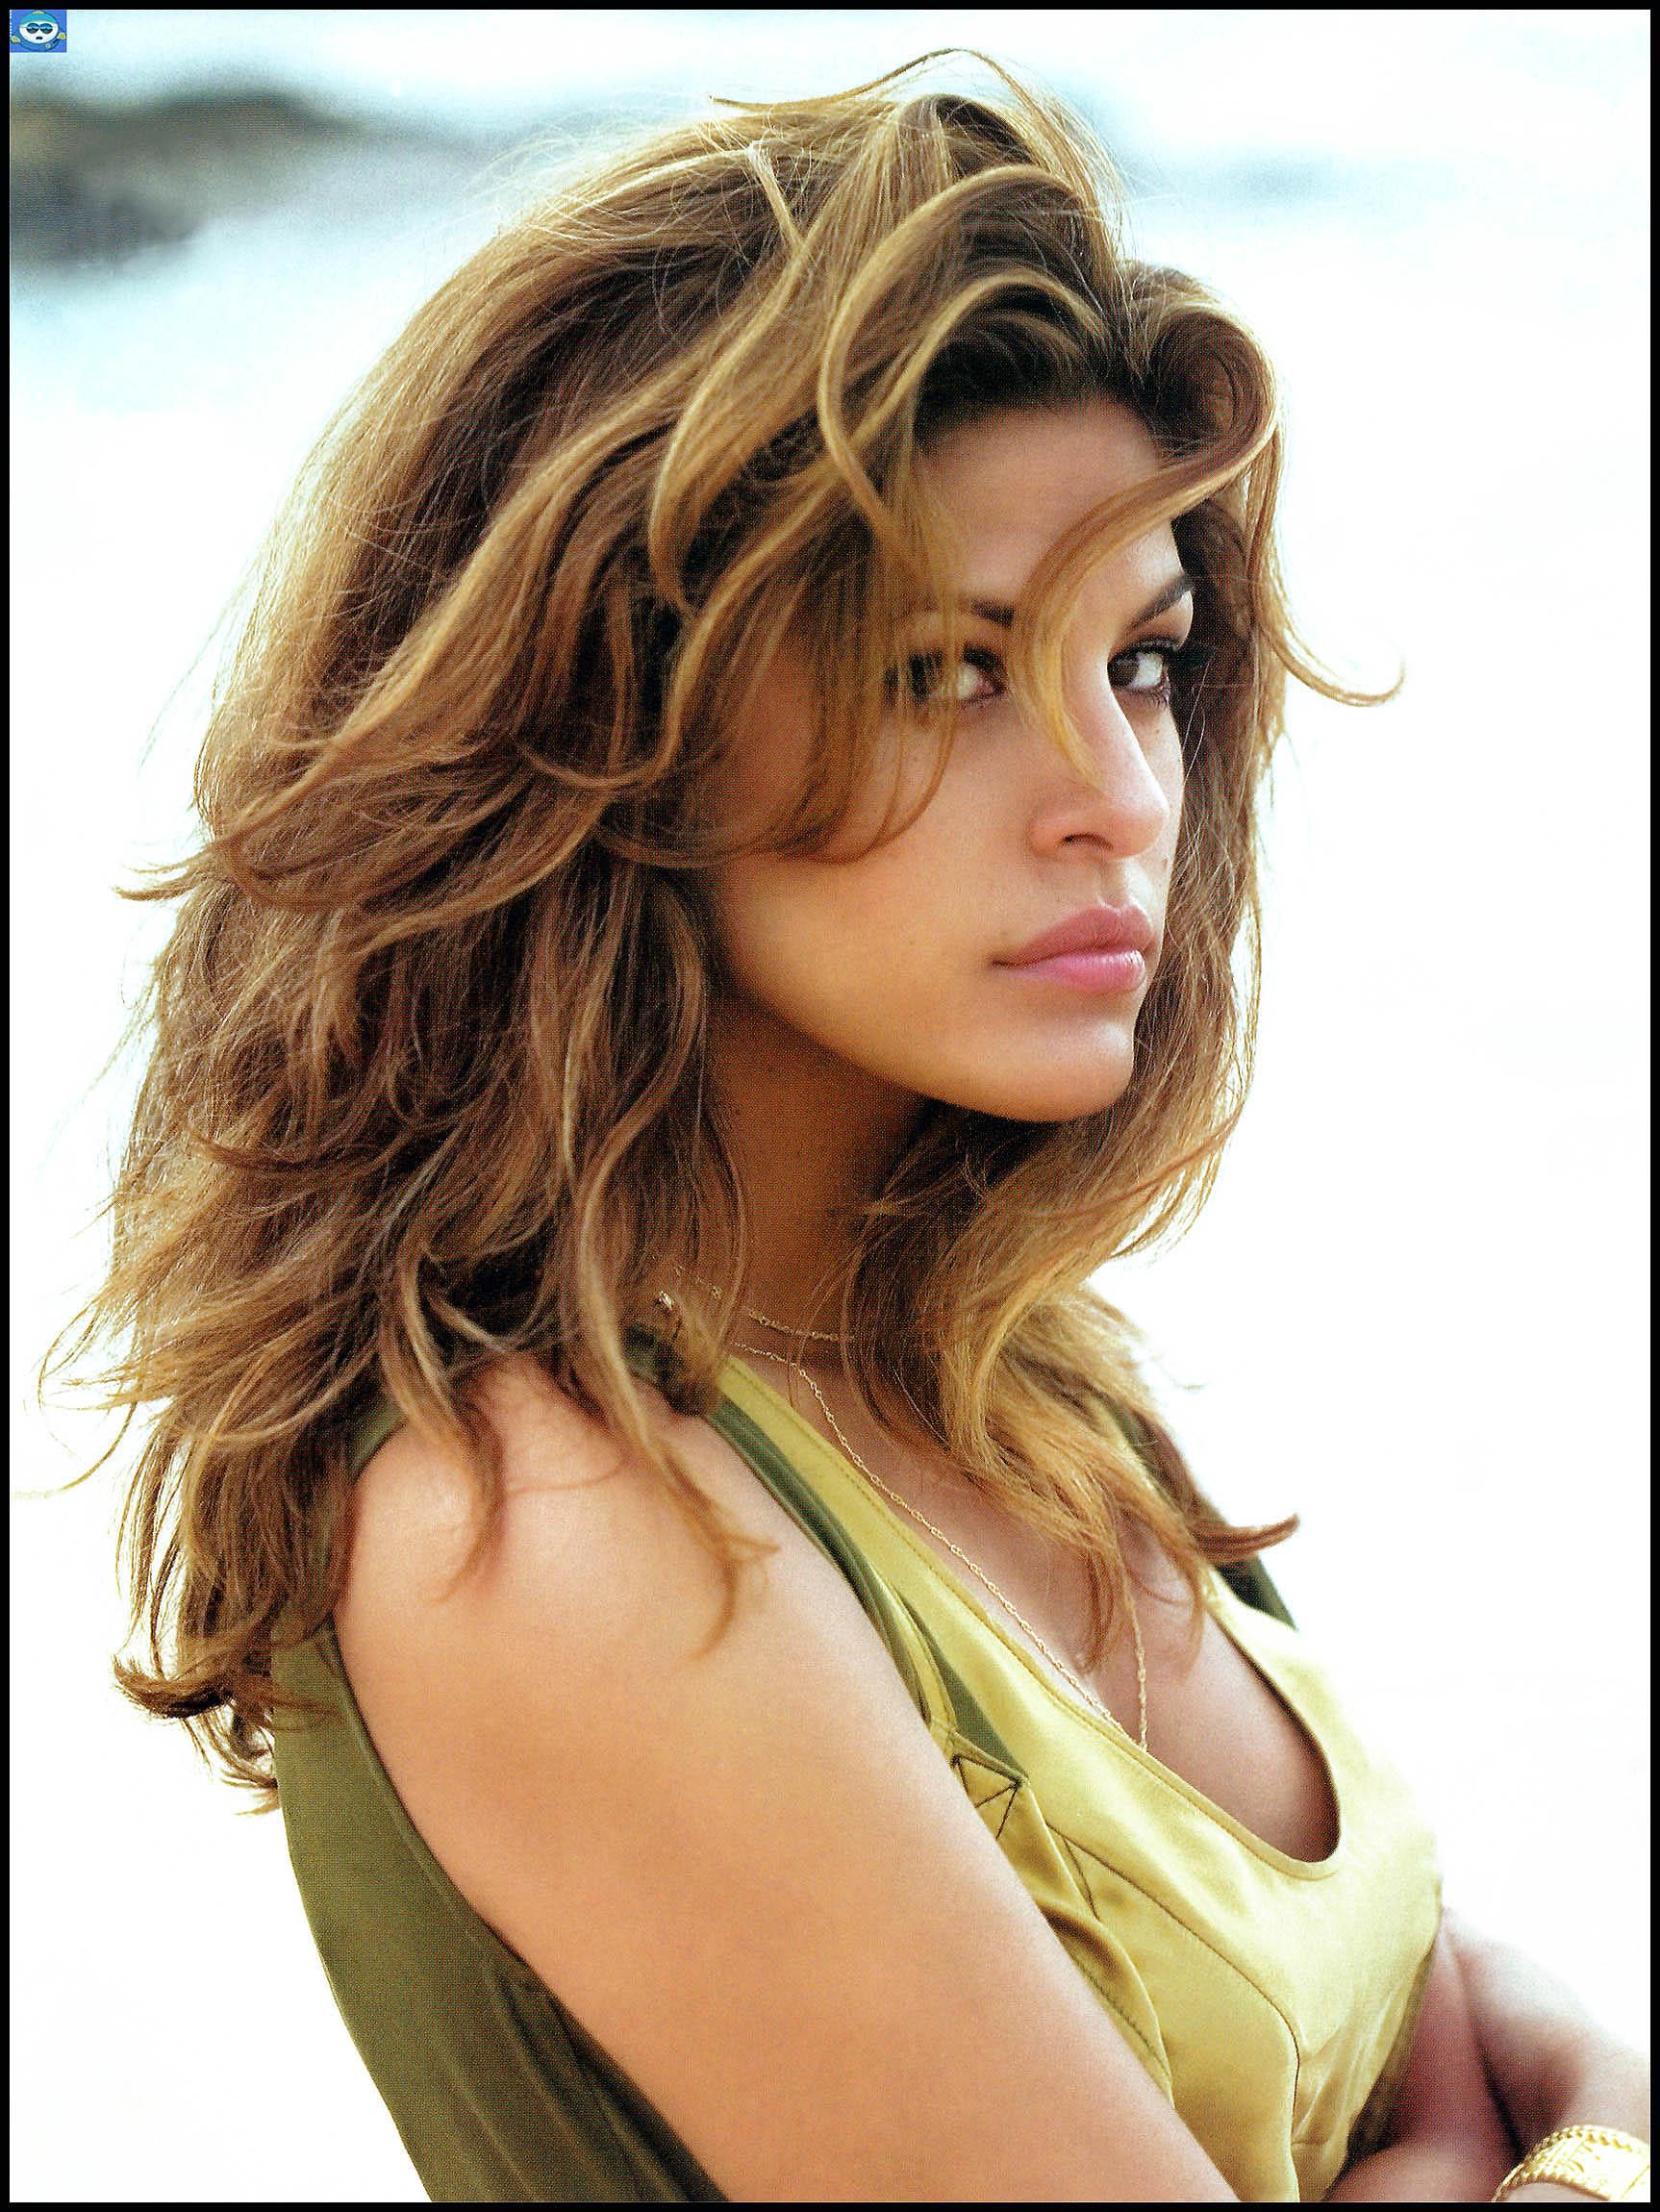 Wallpaper India: Eva Mendes Hot n Sexy Stills